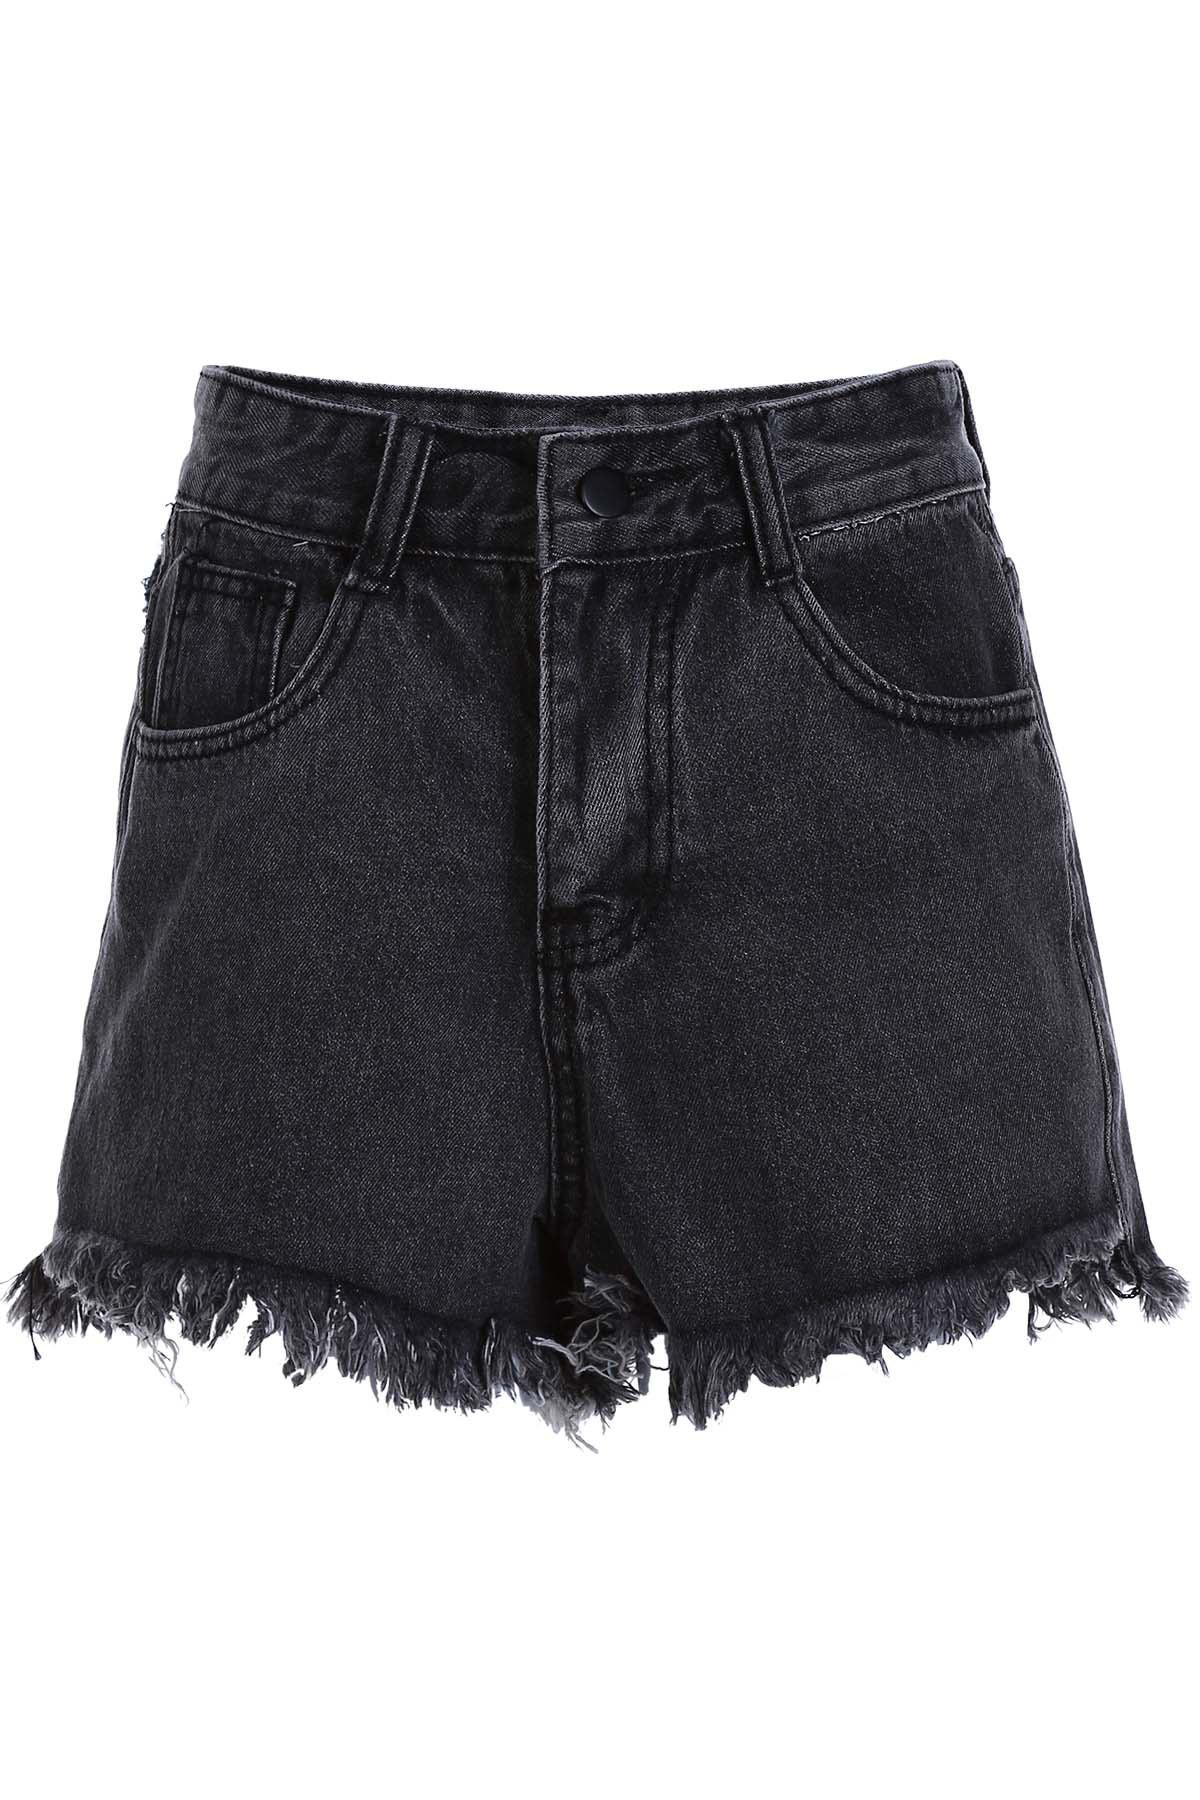 Stylish High Waist Denim Black Women s Shorts 175877702